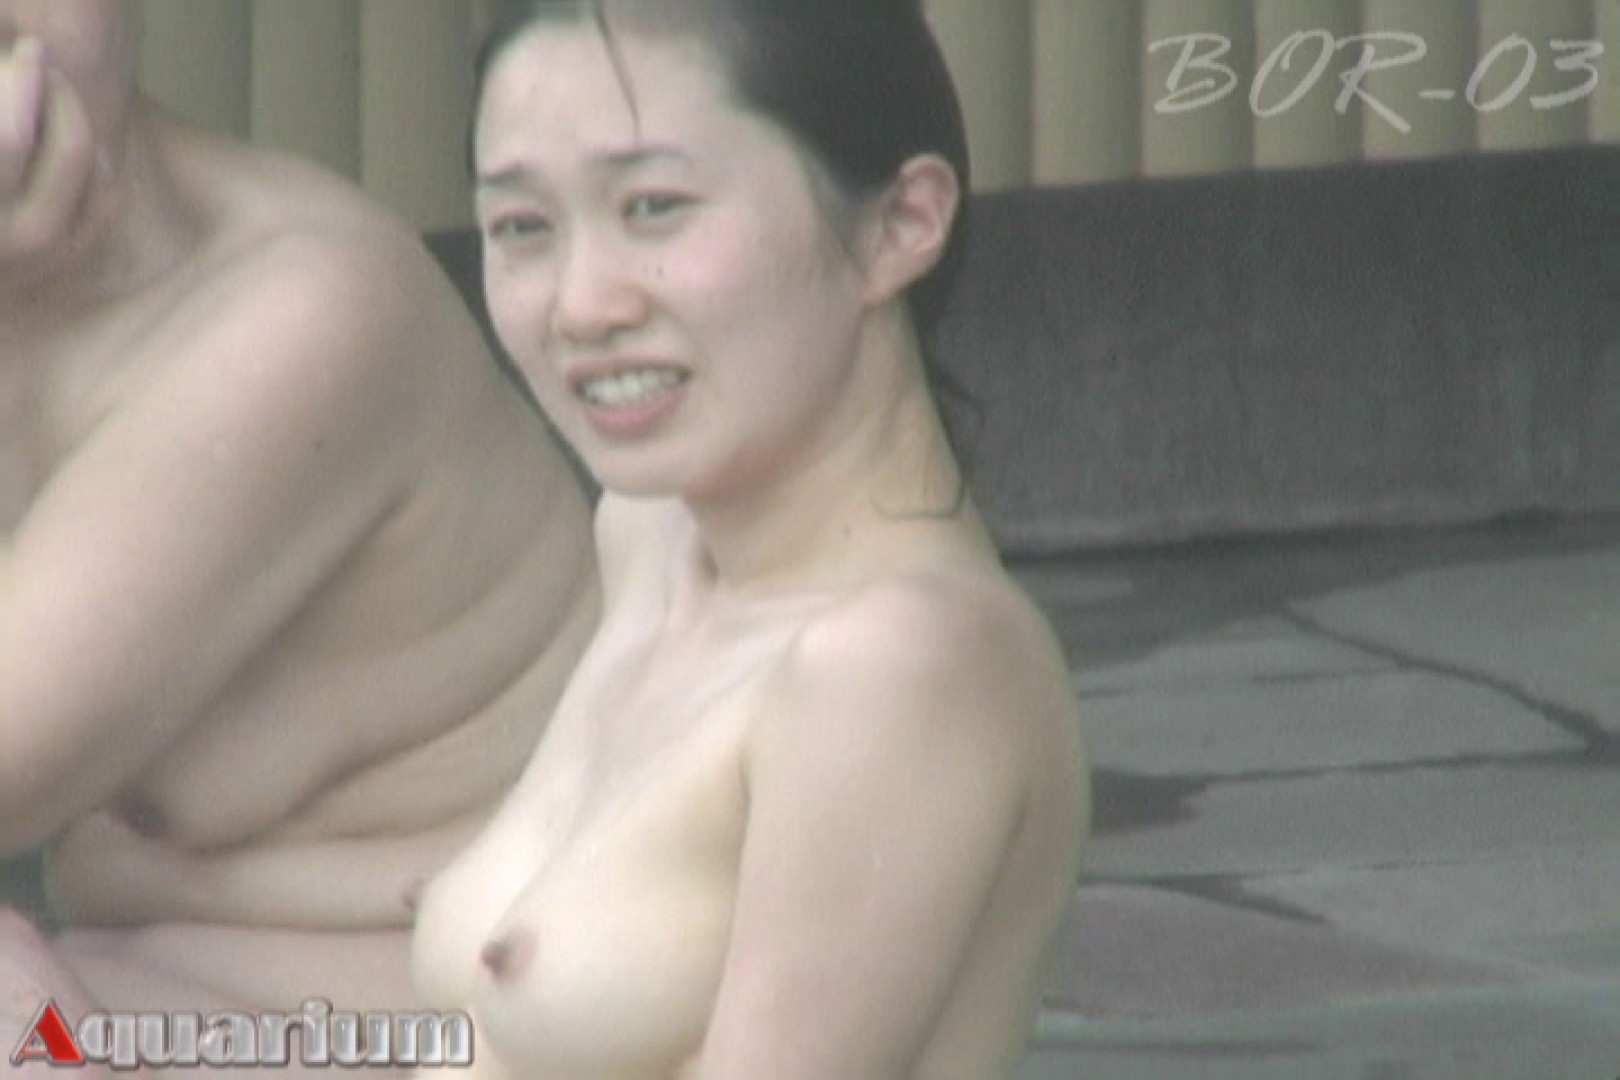 Aquaな露天風呂Vol.486 盗撮 | OLセックス  85画像 52